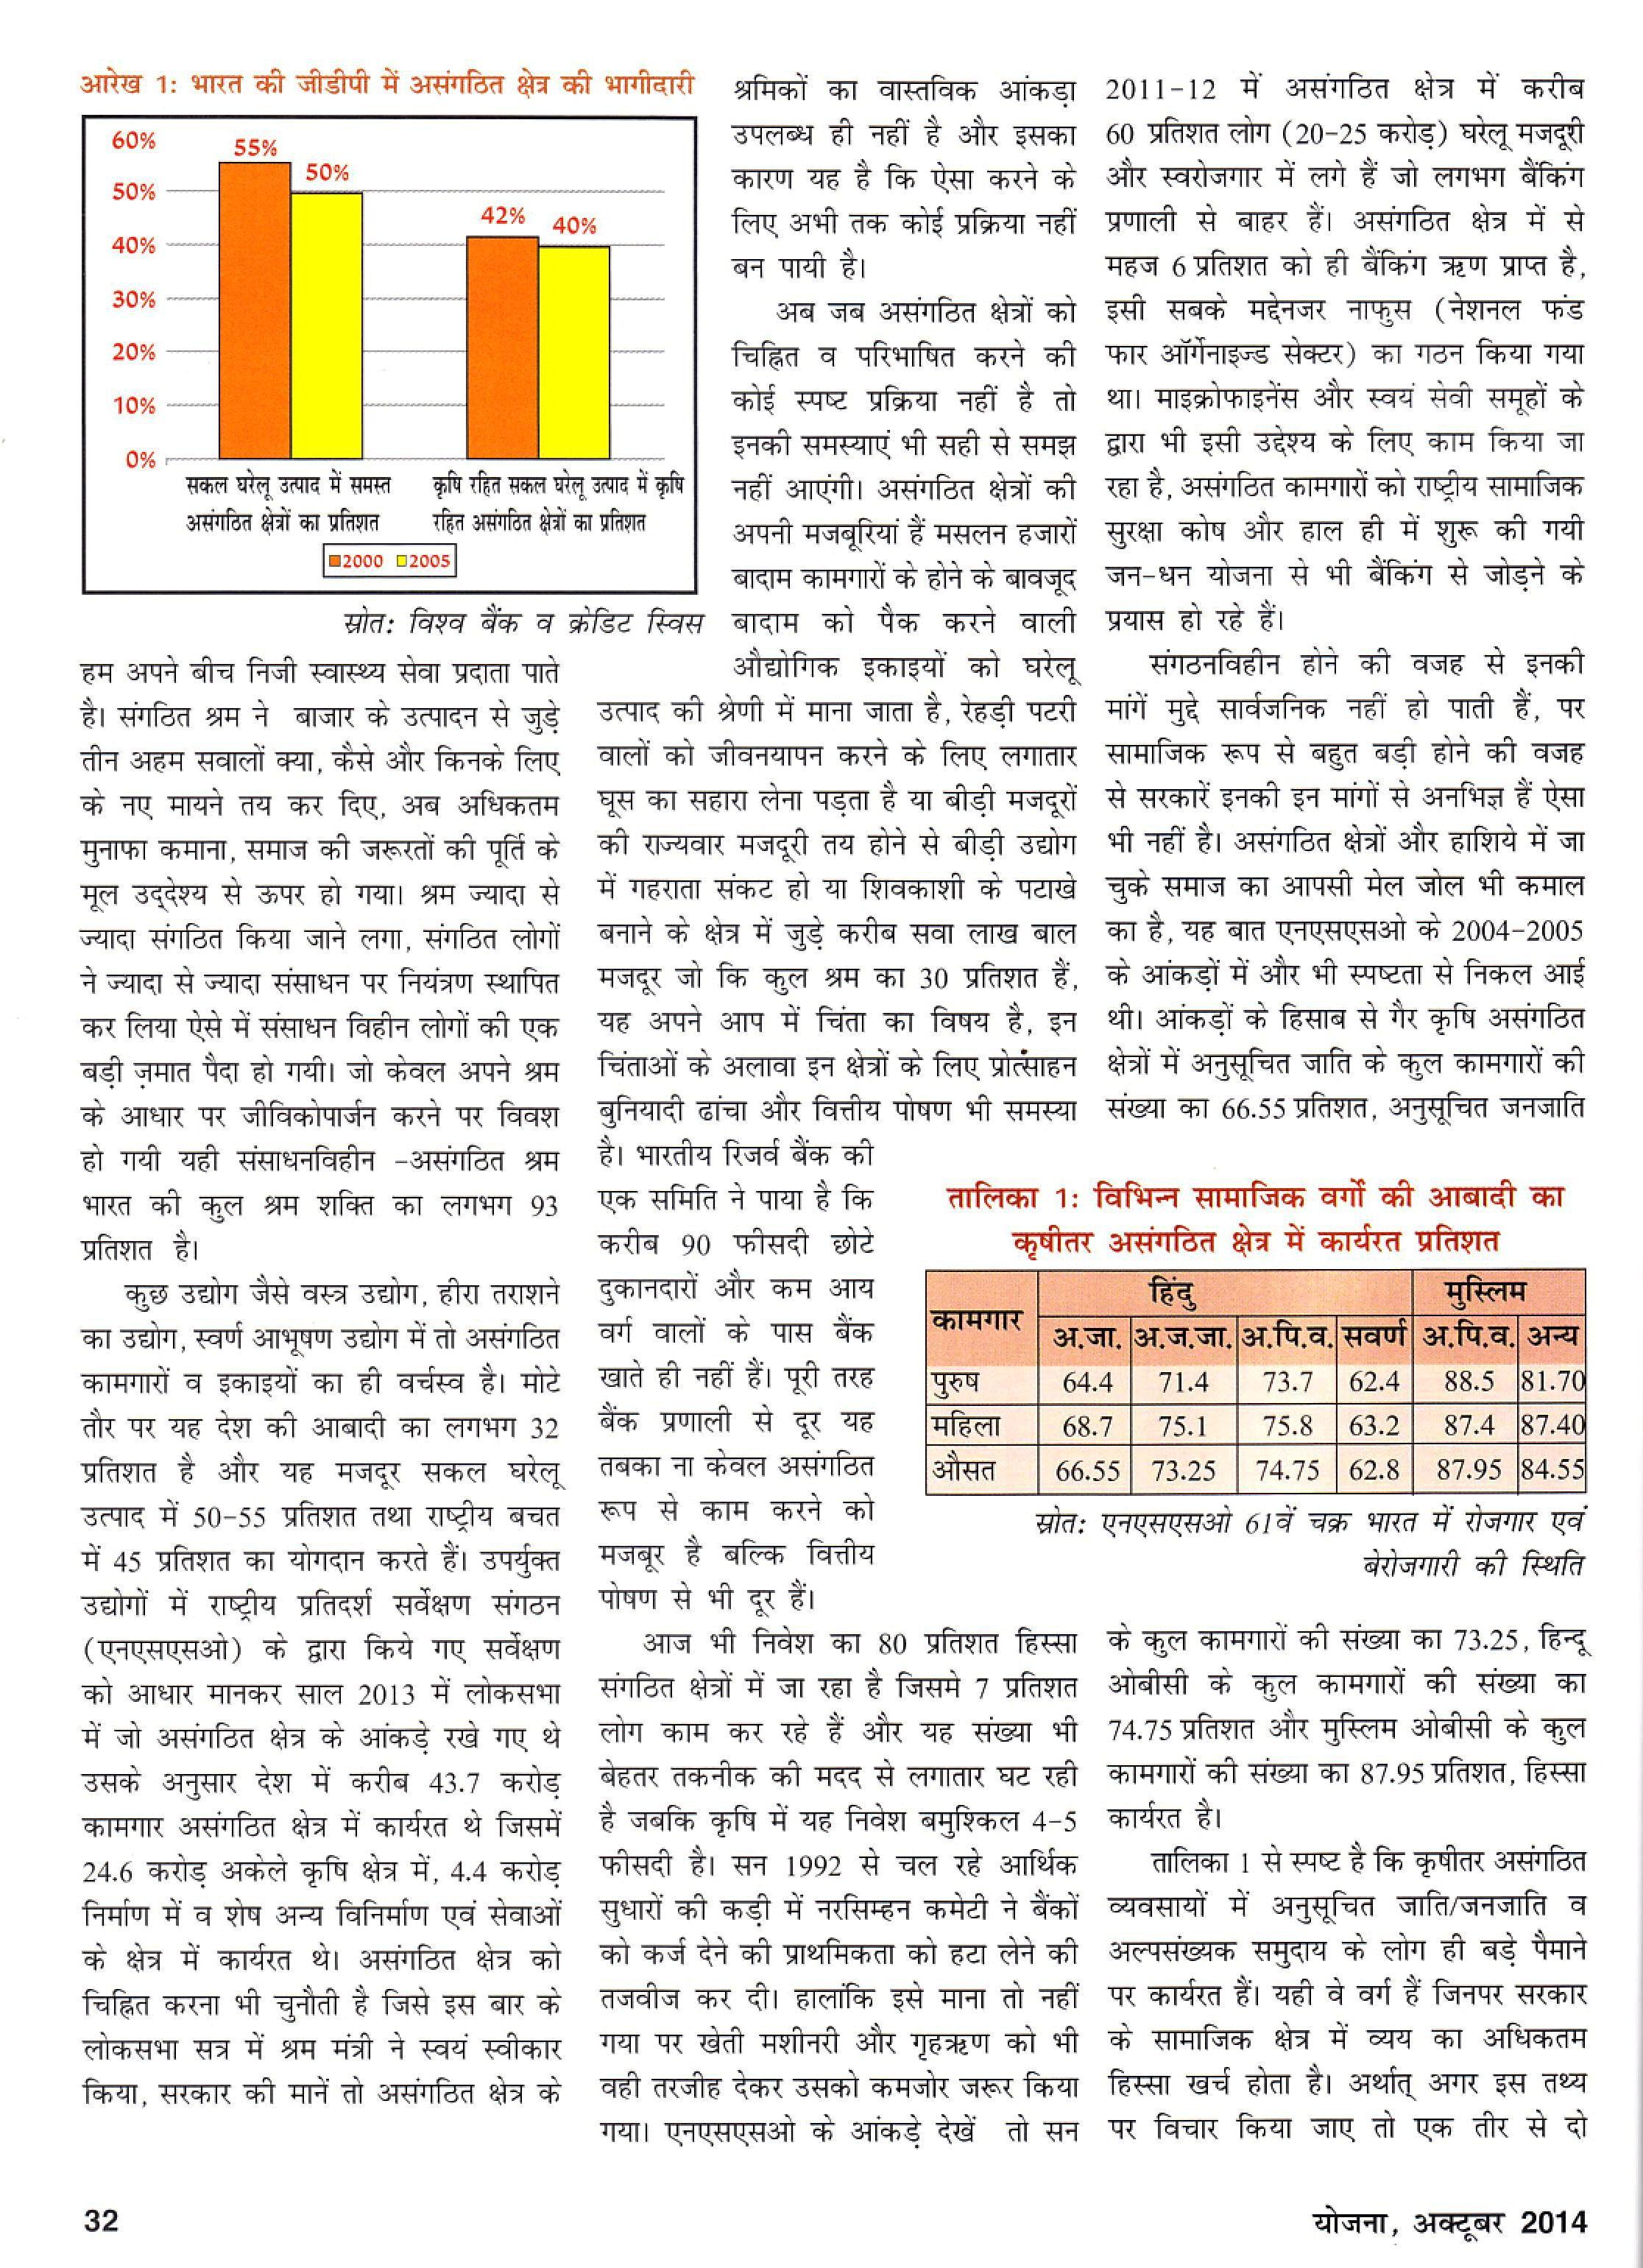 Yojna-page-002